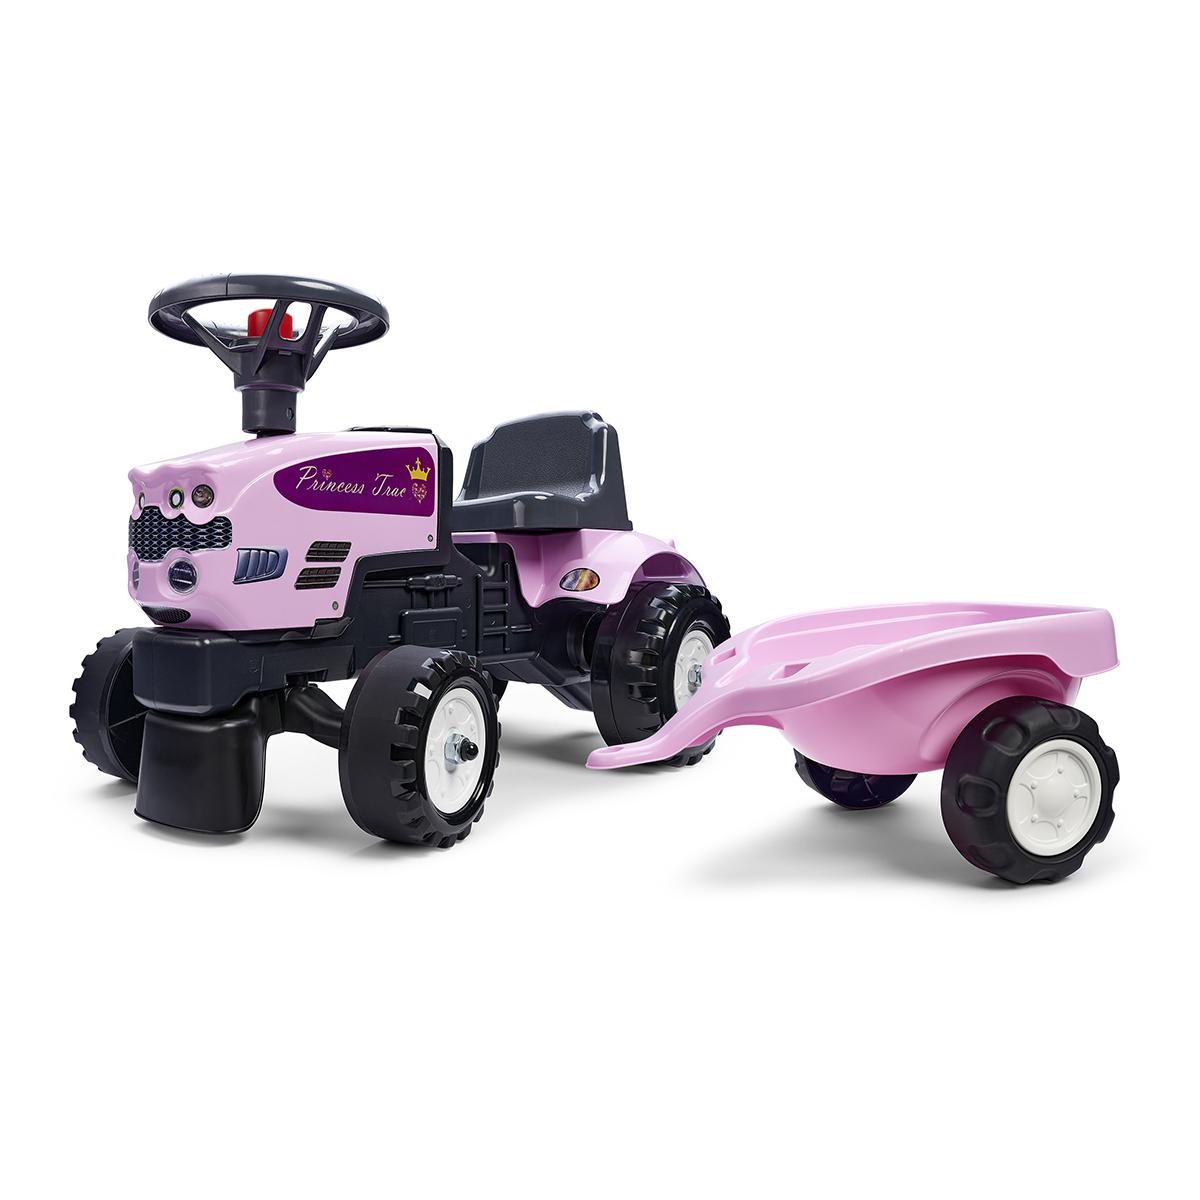 Porteur Falk Tracteur Princess Trac avec remorque - Rose